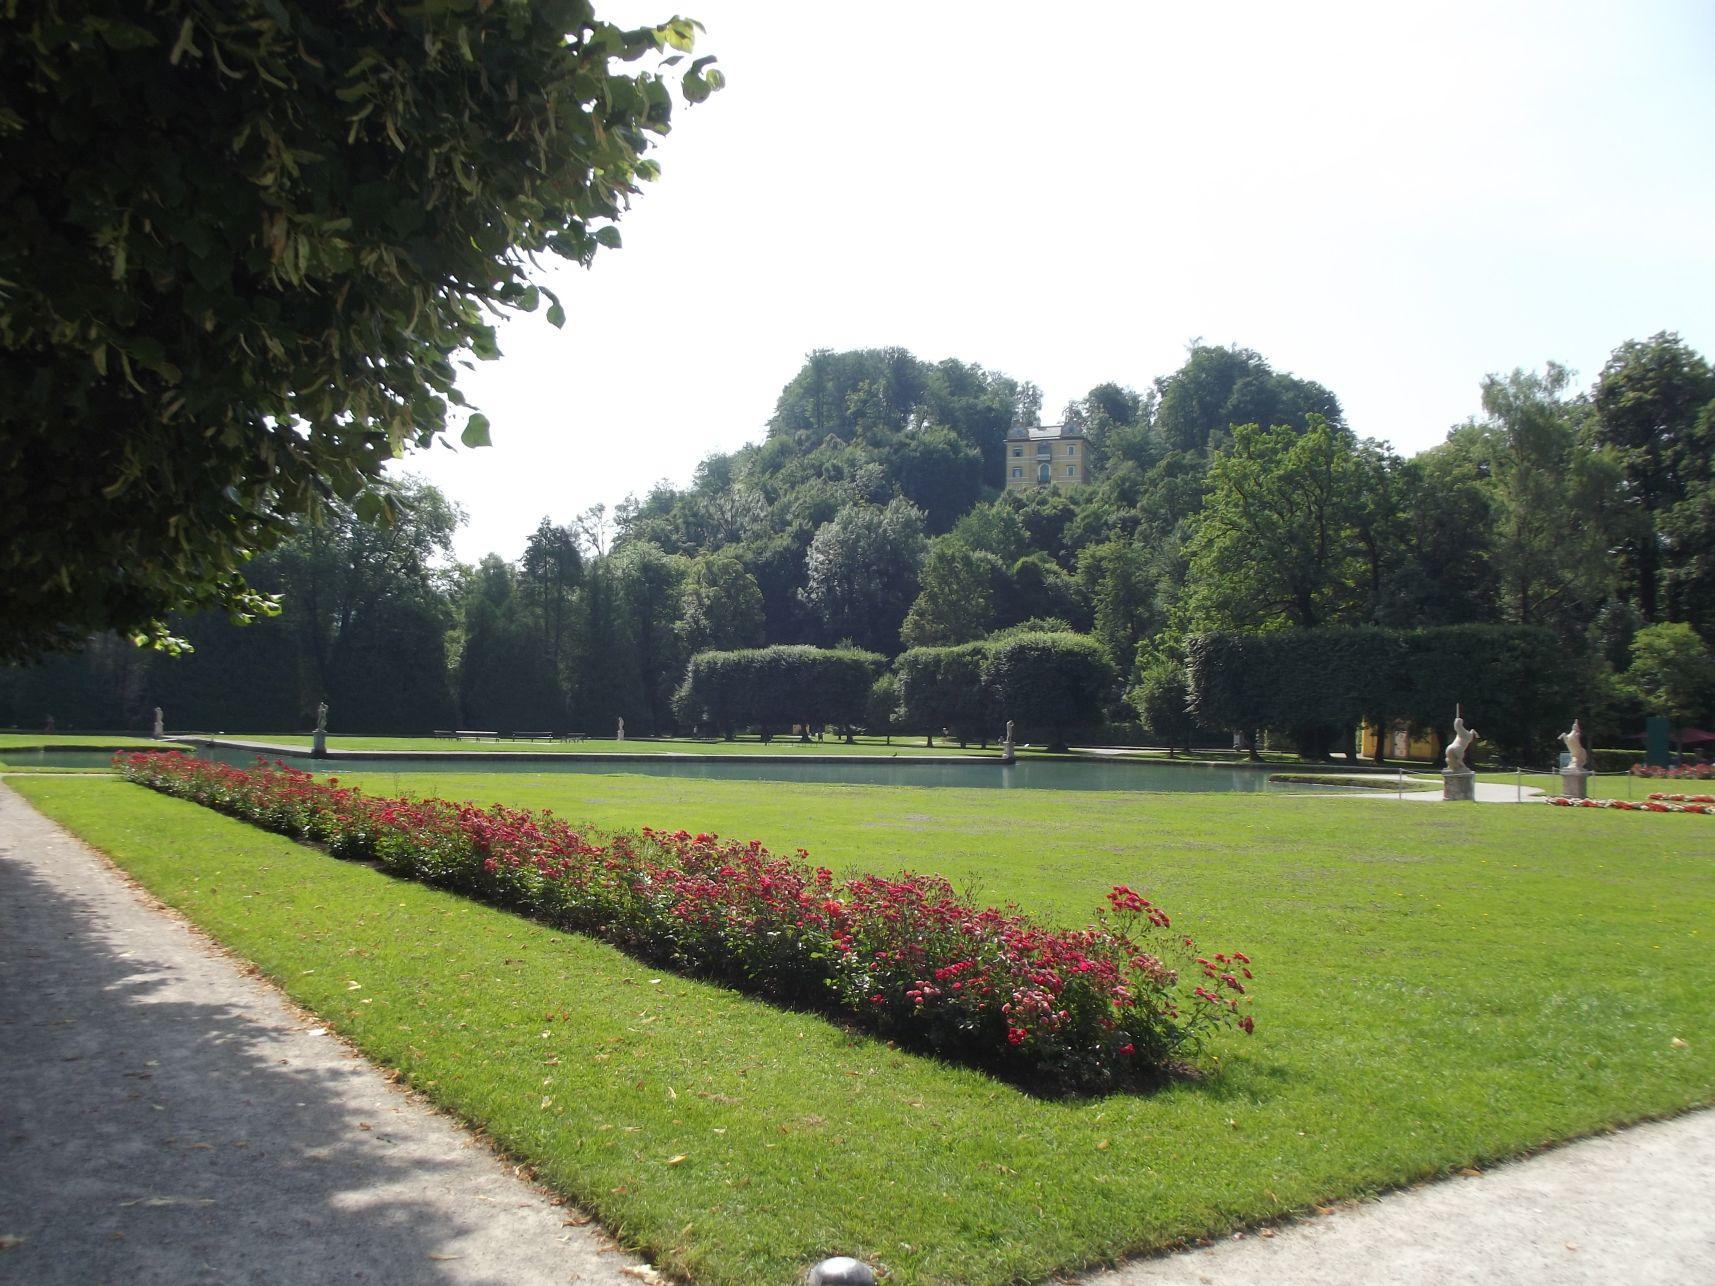 Hellbrunni Kastély parkja